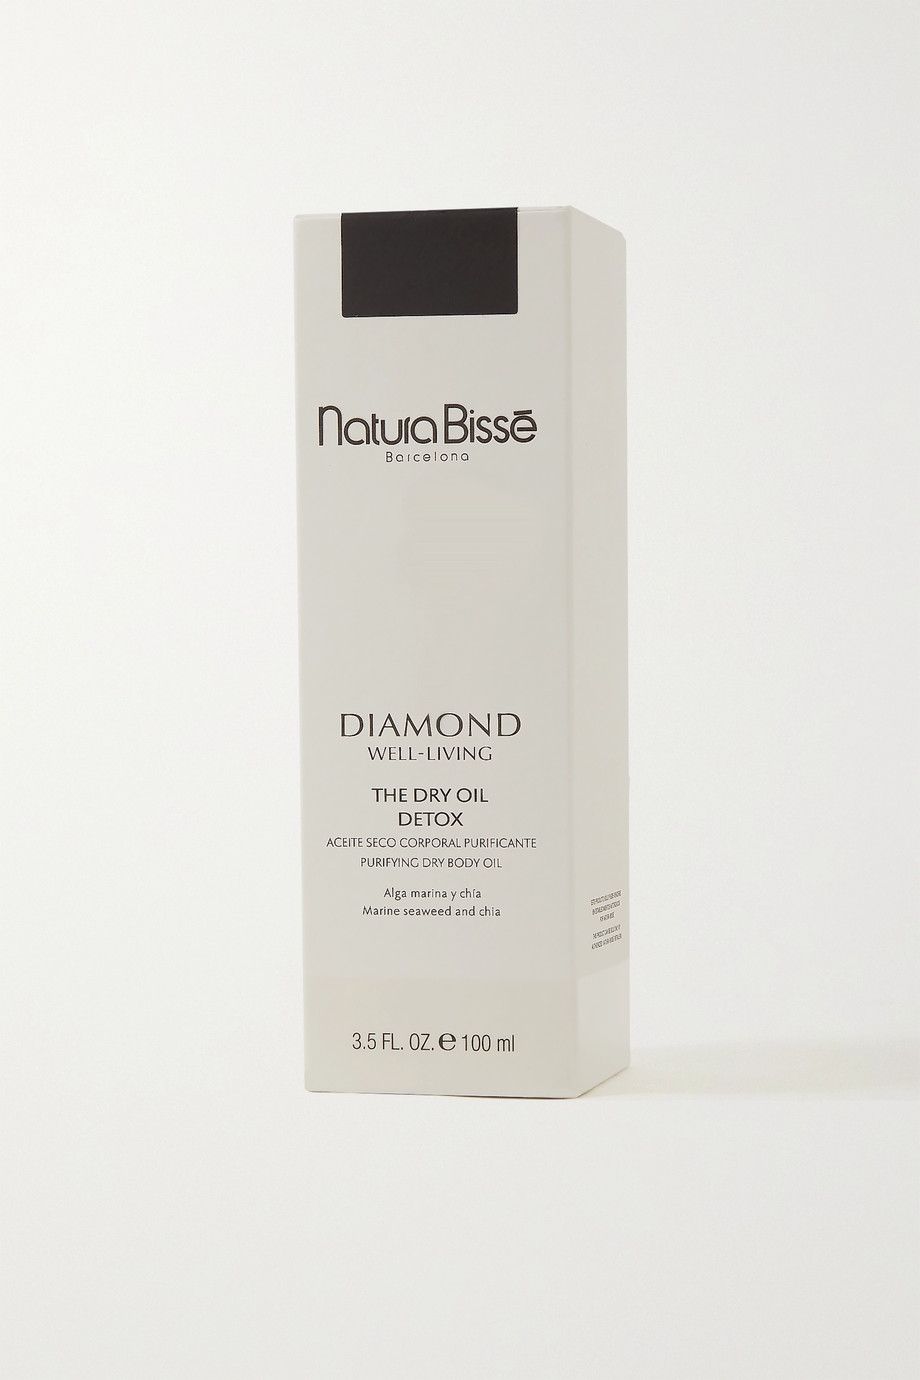 Natura Bissé The Dry Oil - Detox, 100ml